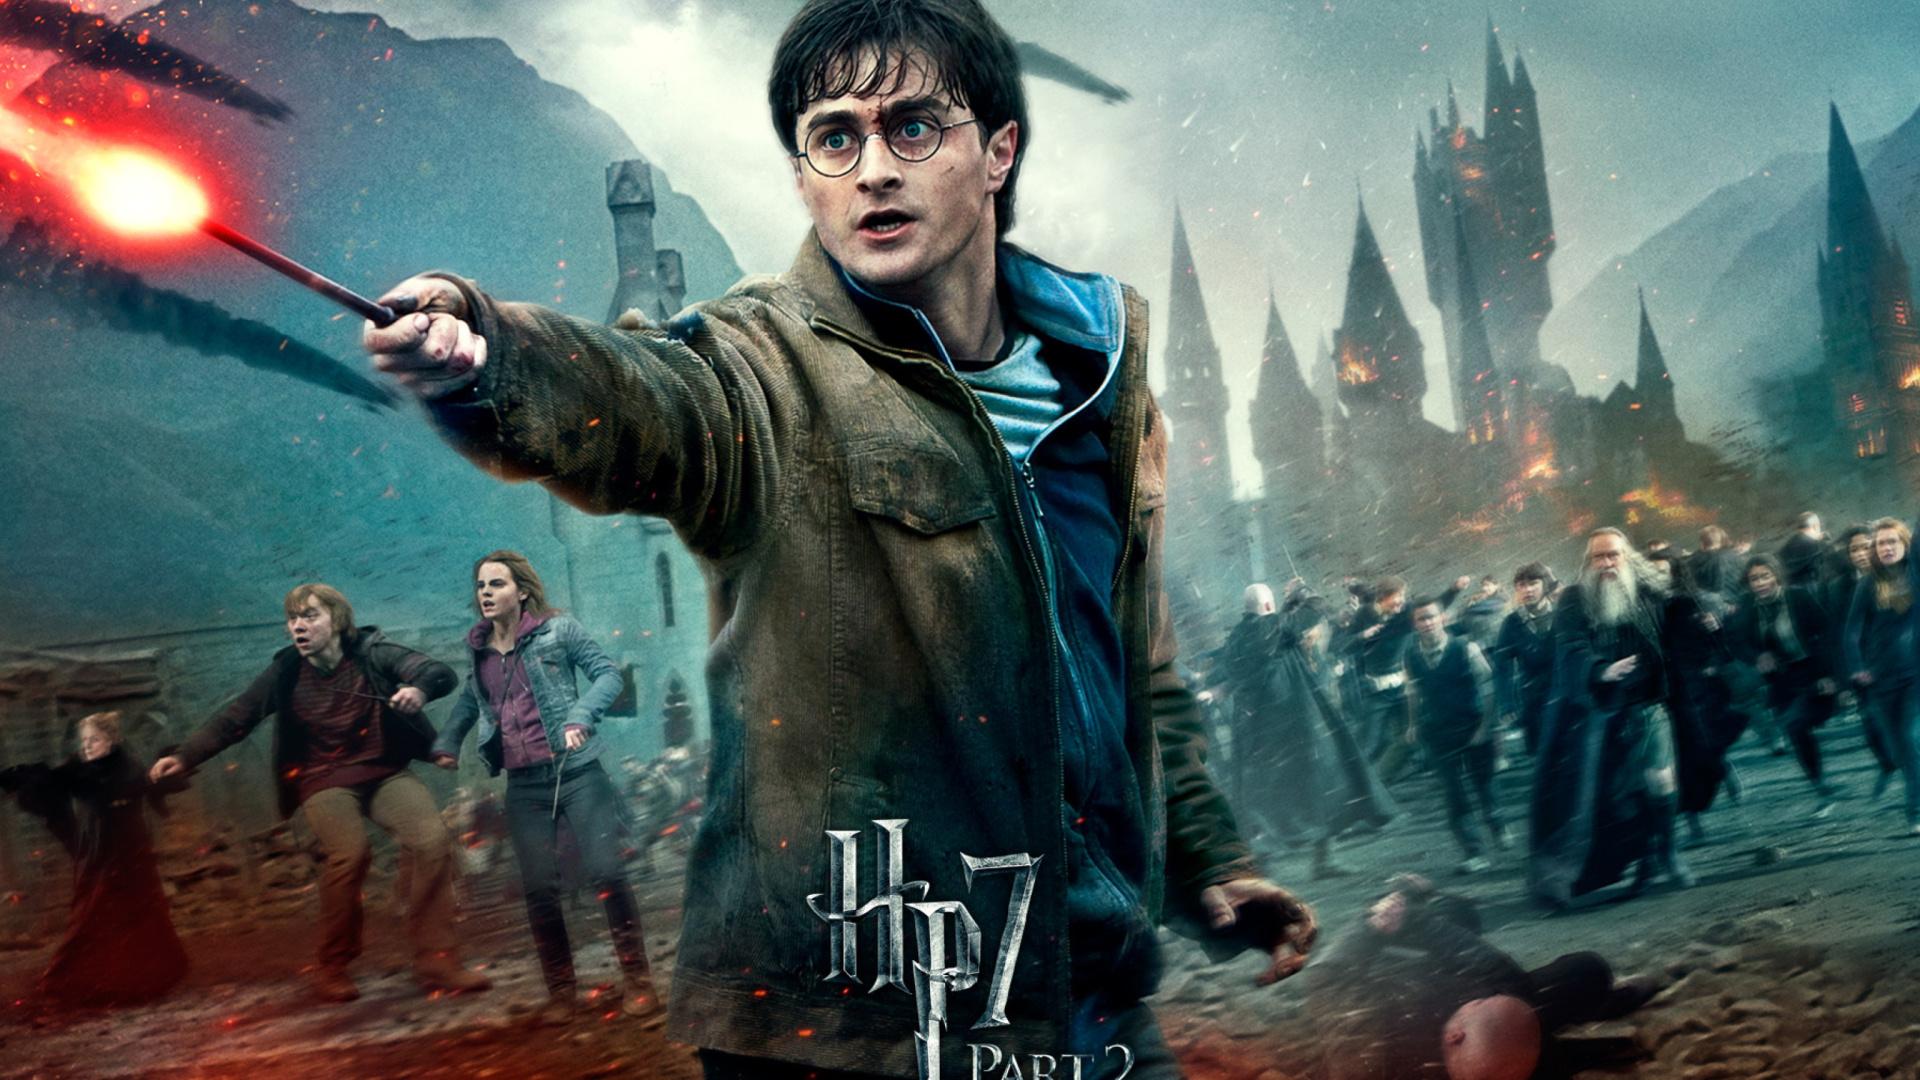 Harry Potter HP7 1920x1080 wallpaper1920X1080 wallpaper screensaver 1920x1080